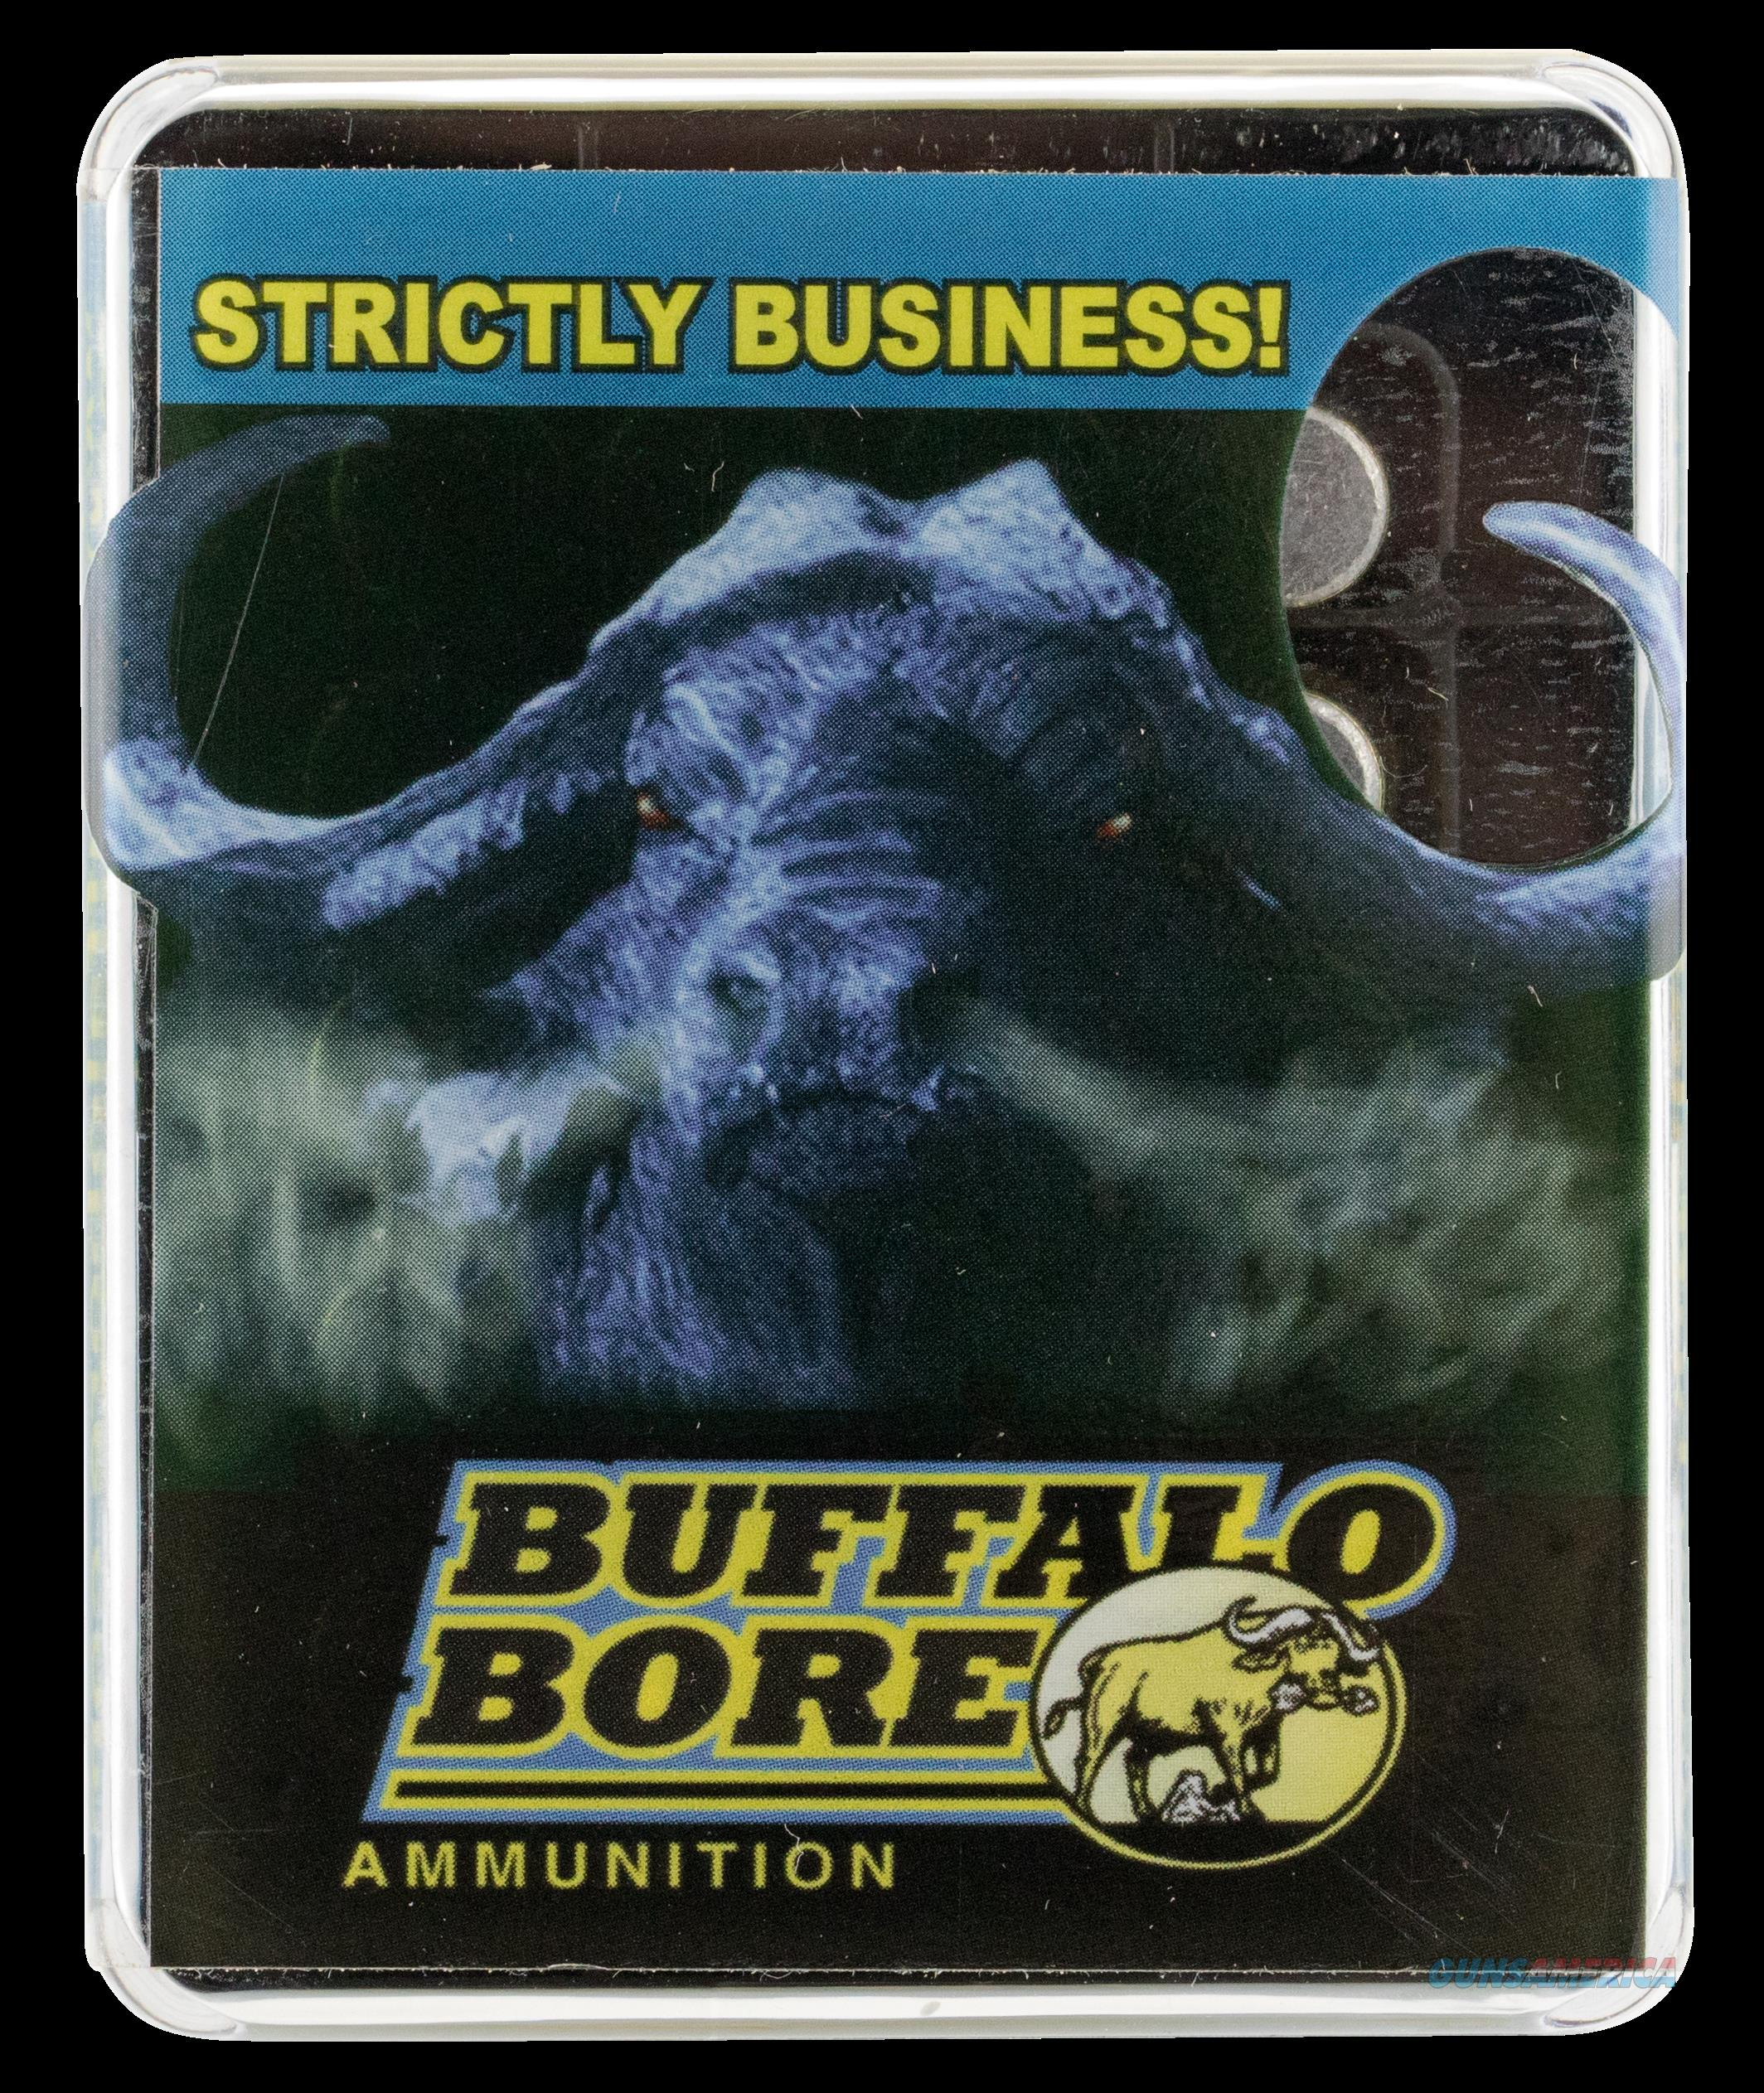 Buffalo Bore Ammunition Buffalo-barnes, Bba 7d-20 454cas 250g Brn Xpb    20-12   Lead Free  Guns > Pistols > 1911 Pistol Copies (non-Colt)